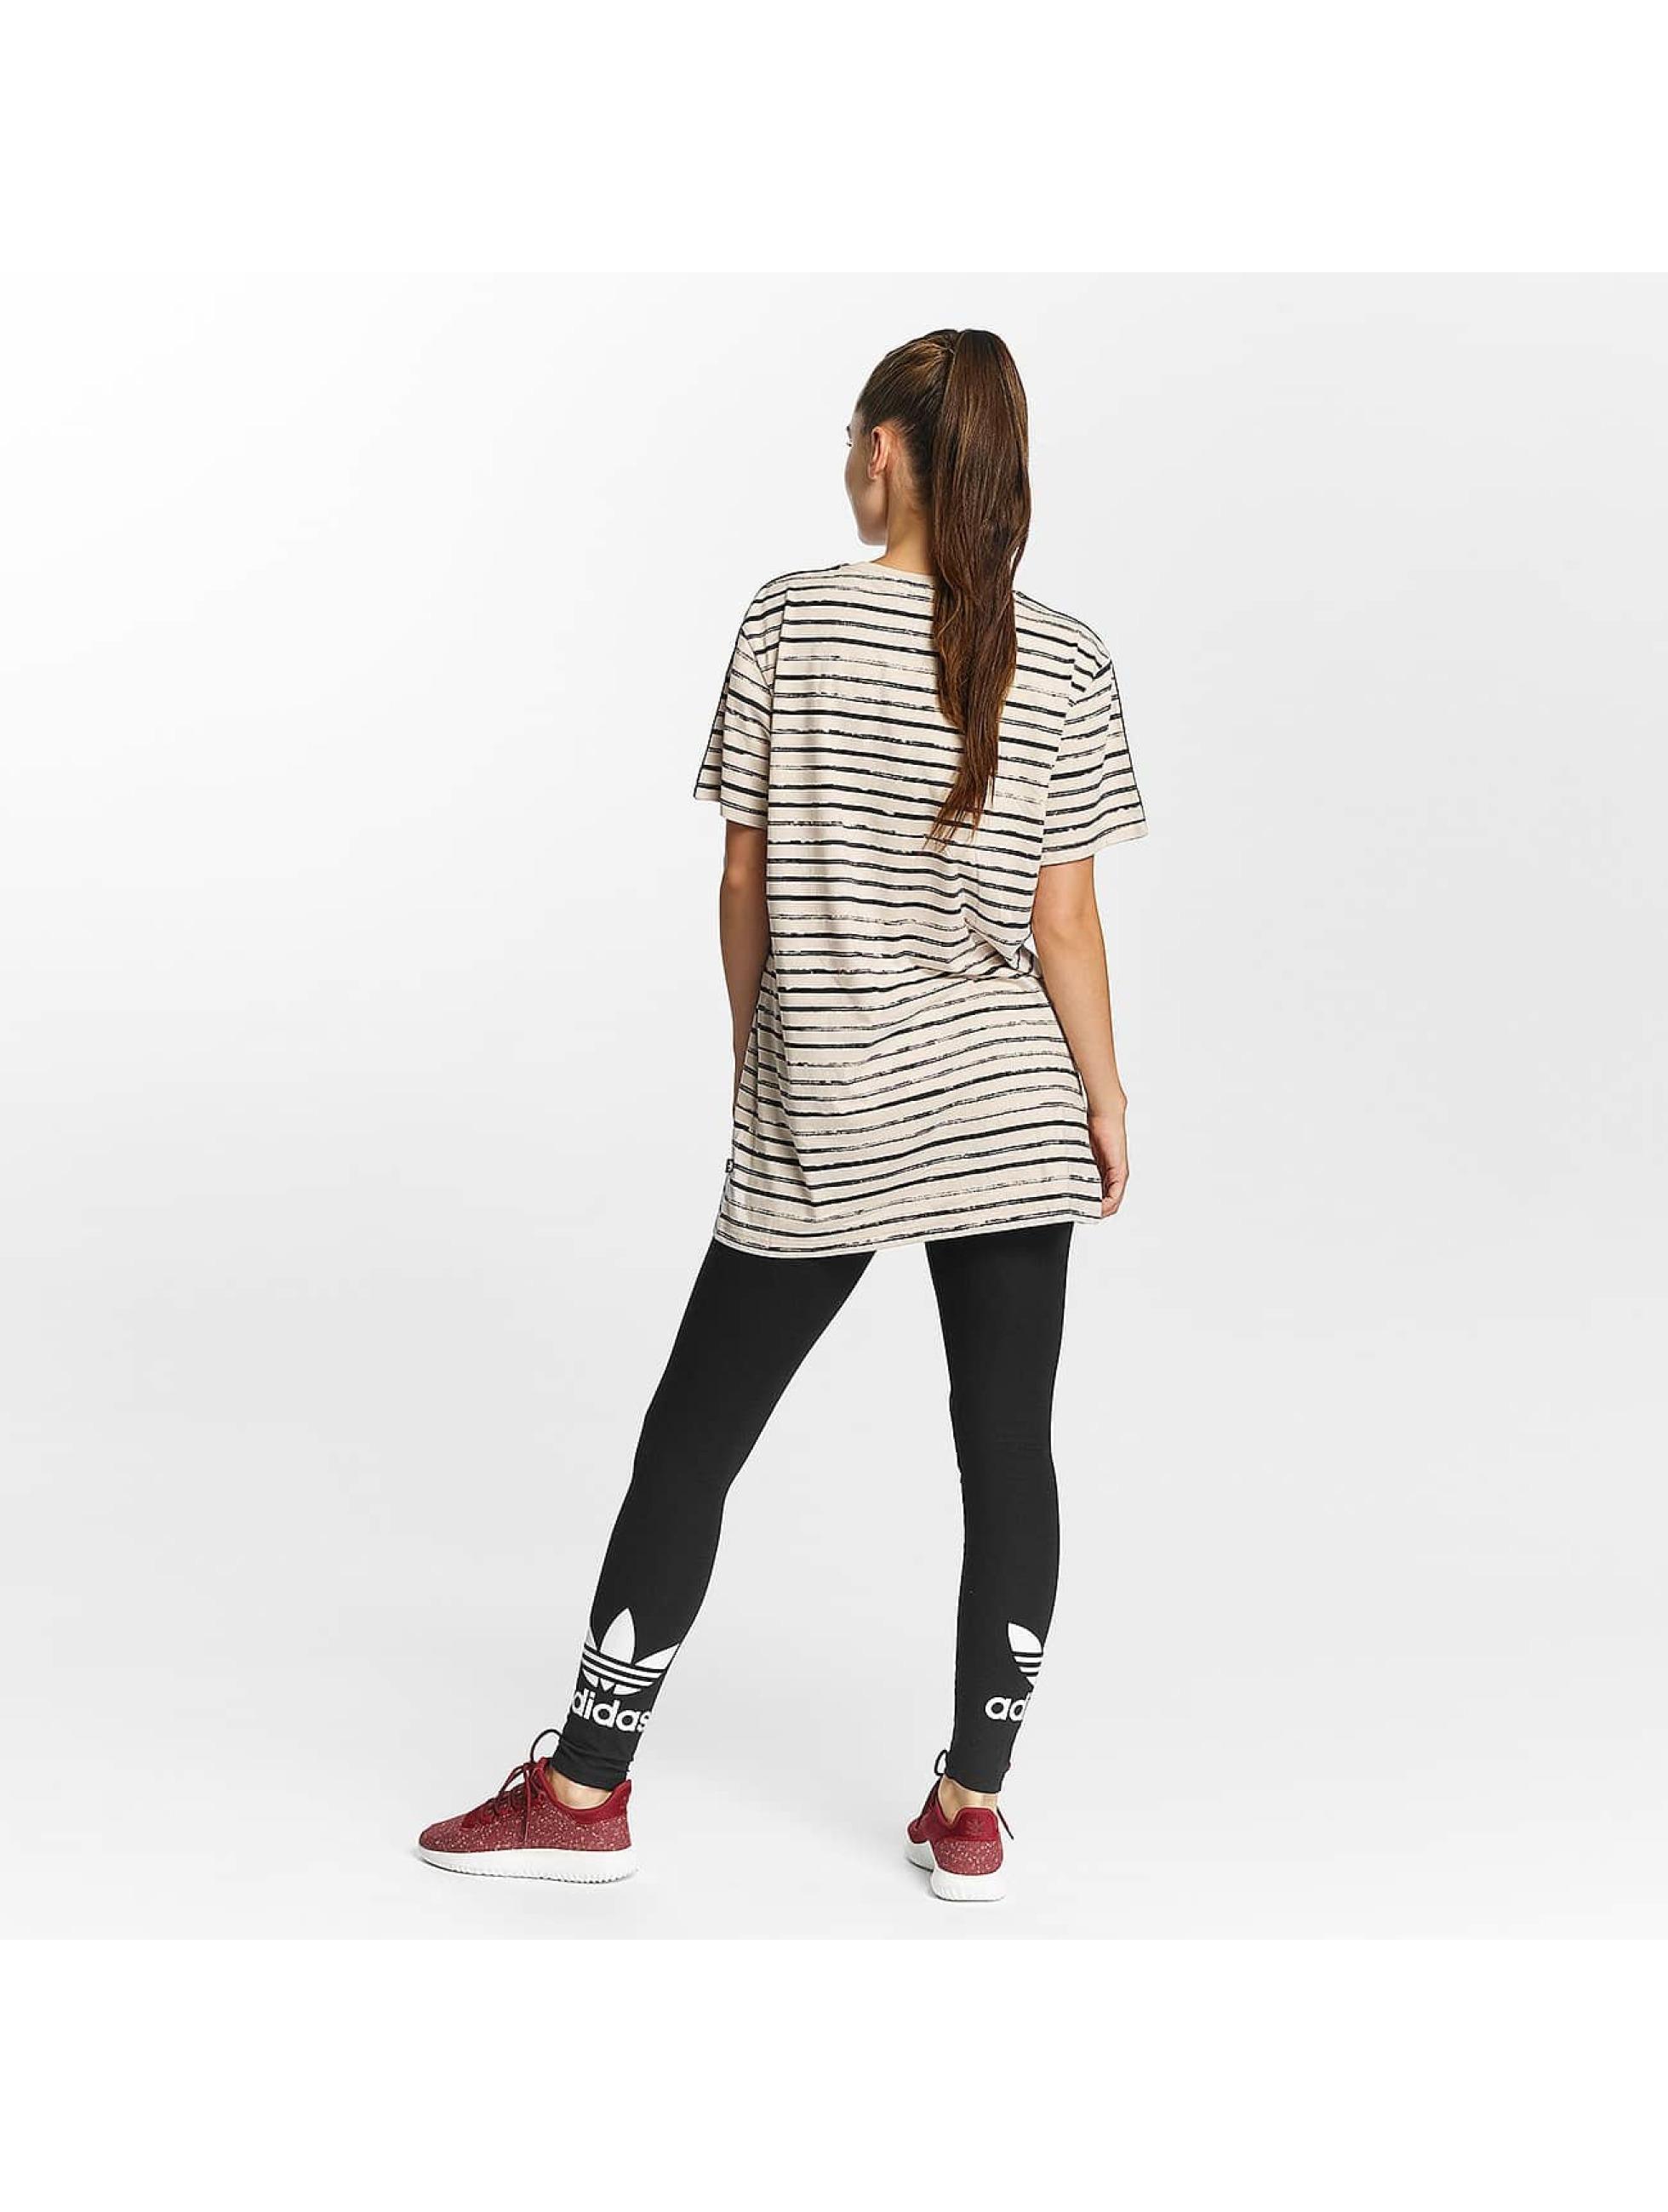 adidas T-shirts Marie Antoinette brun